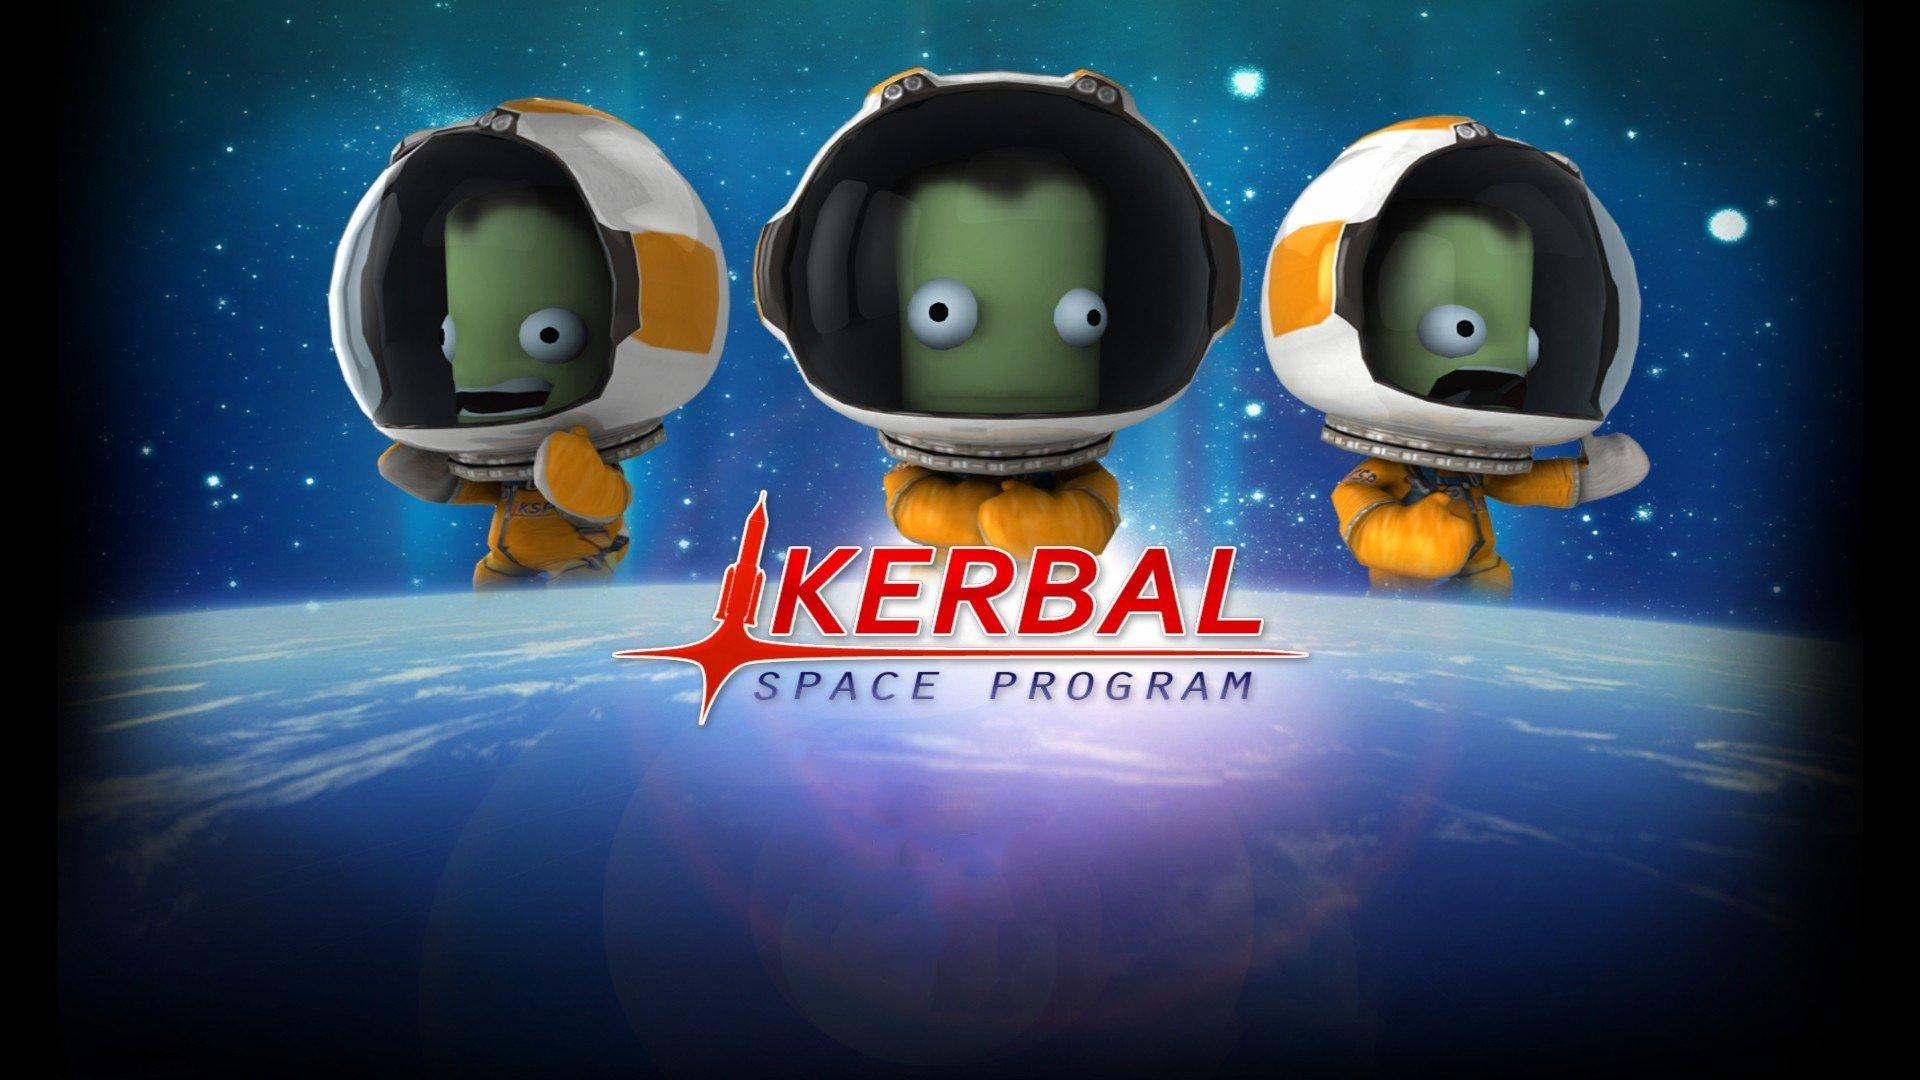 Kerbal Space Program Fondo De Pantalla Hd Fondo De